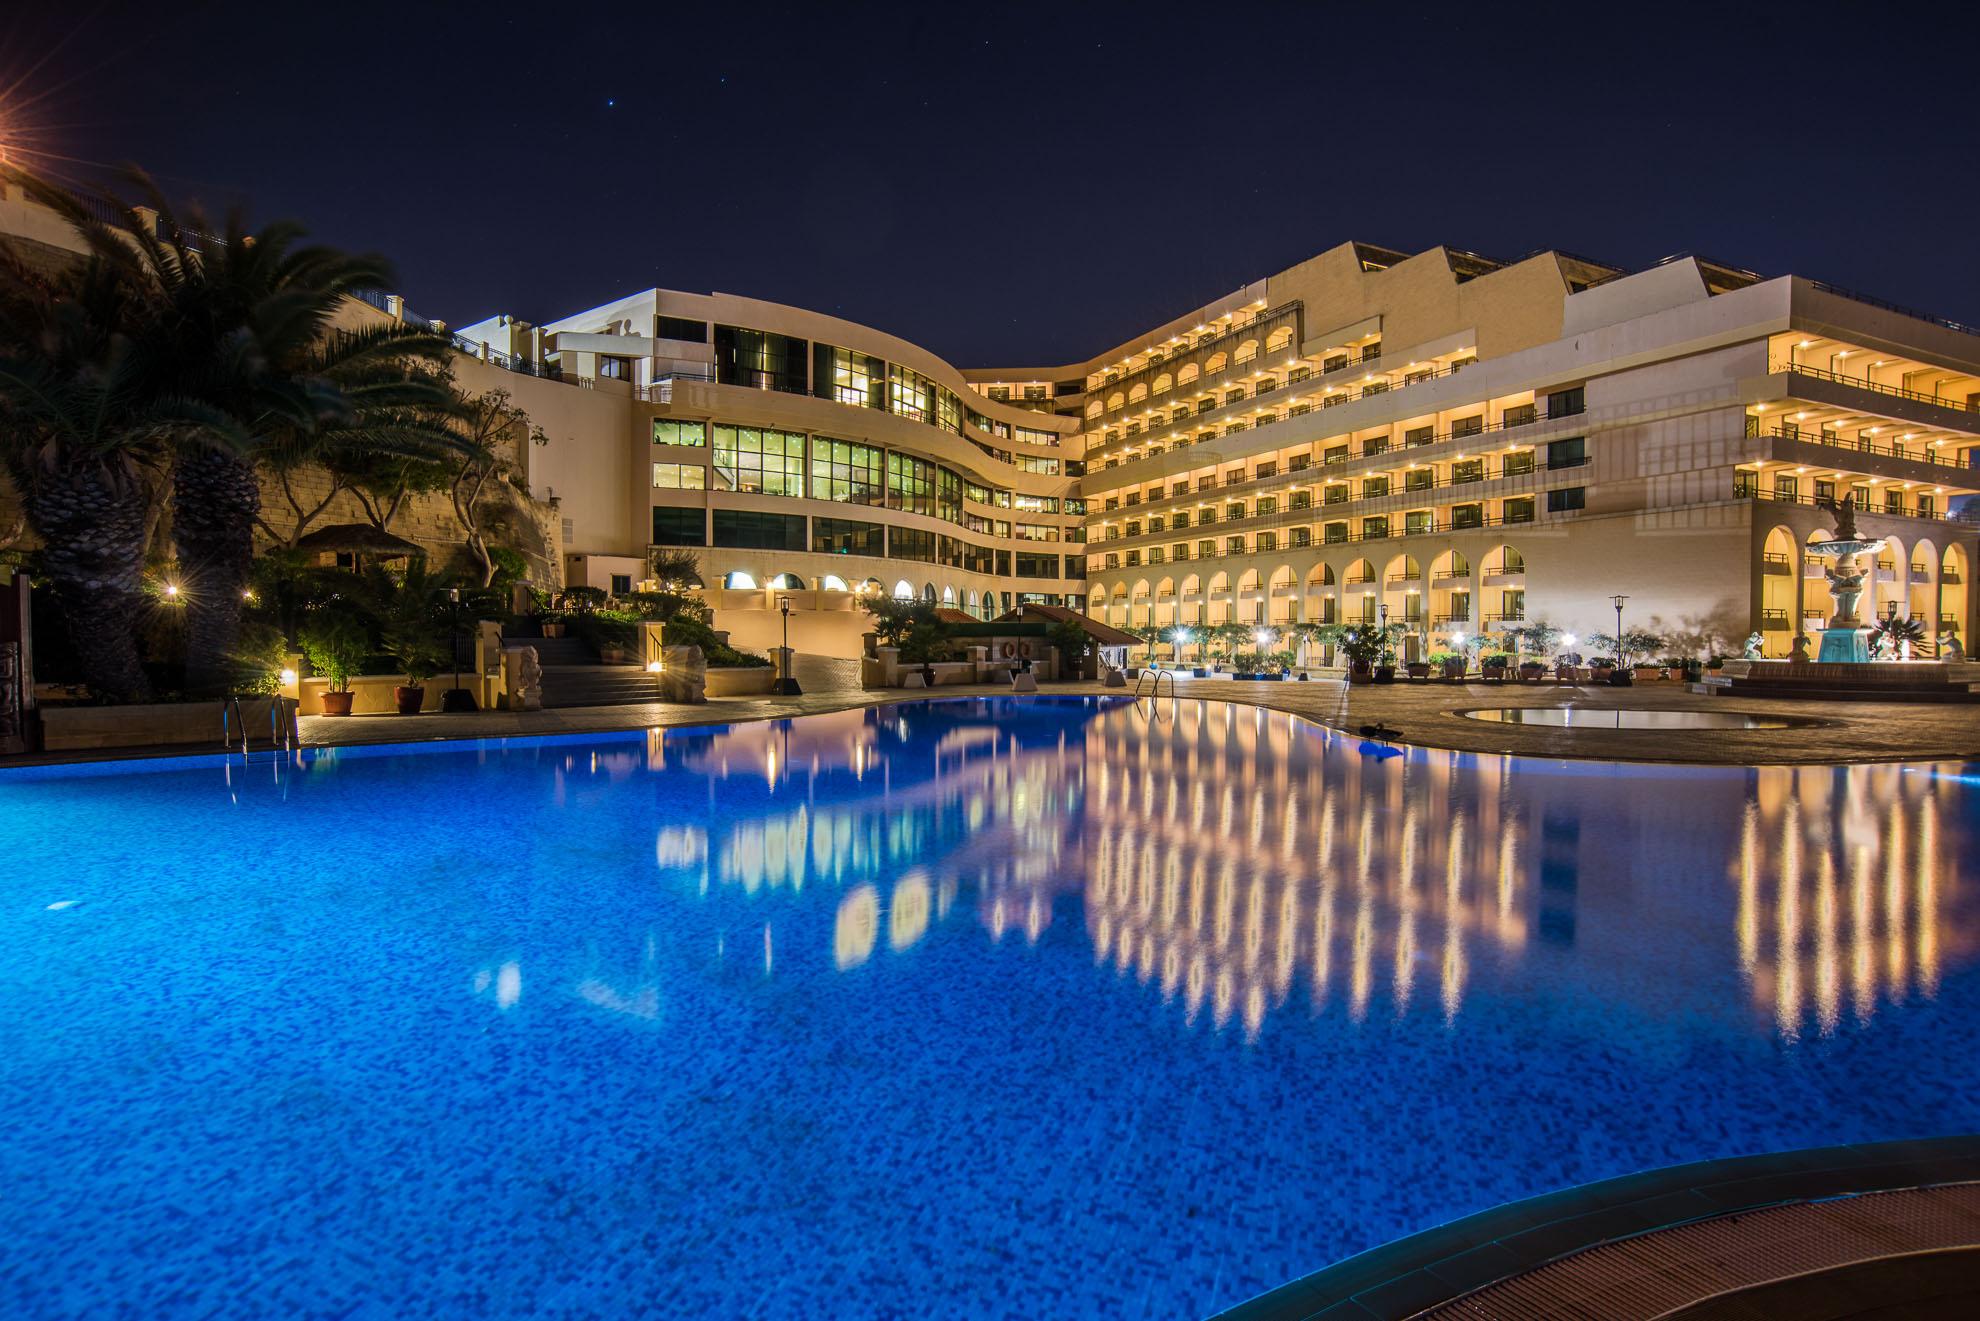 Outdoor-Pool-at-Night.jpg